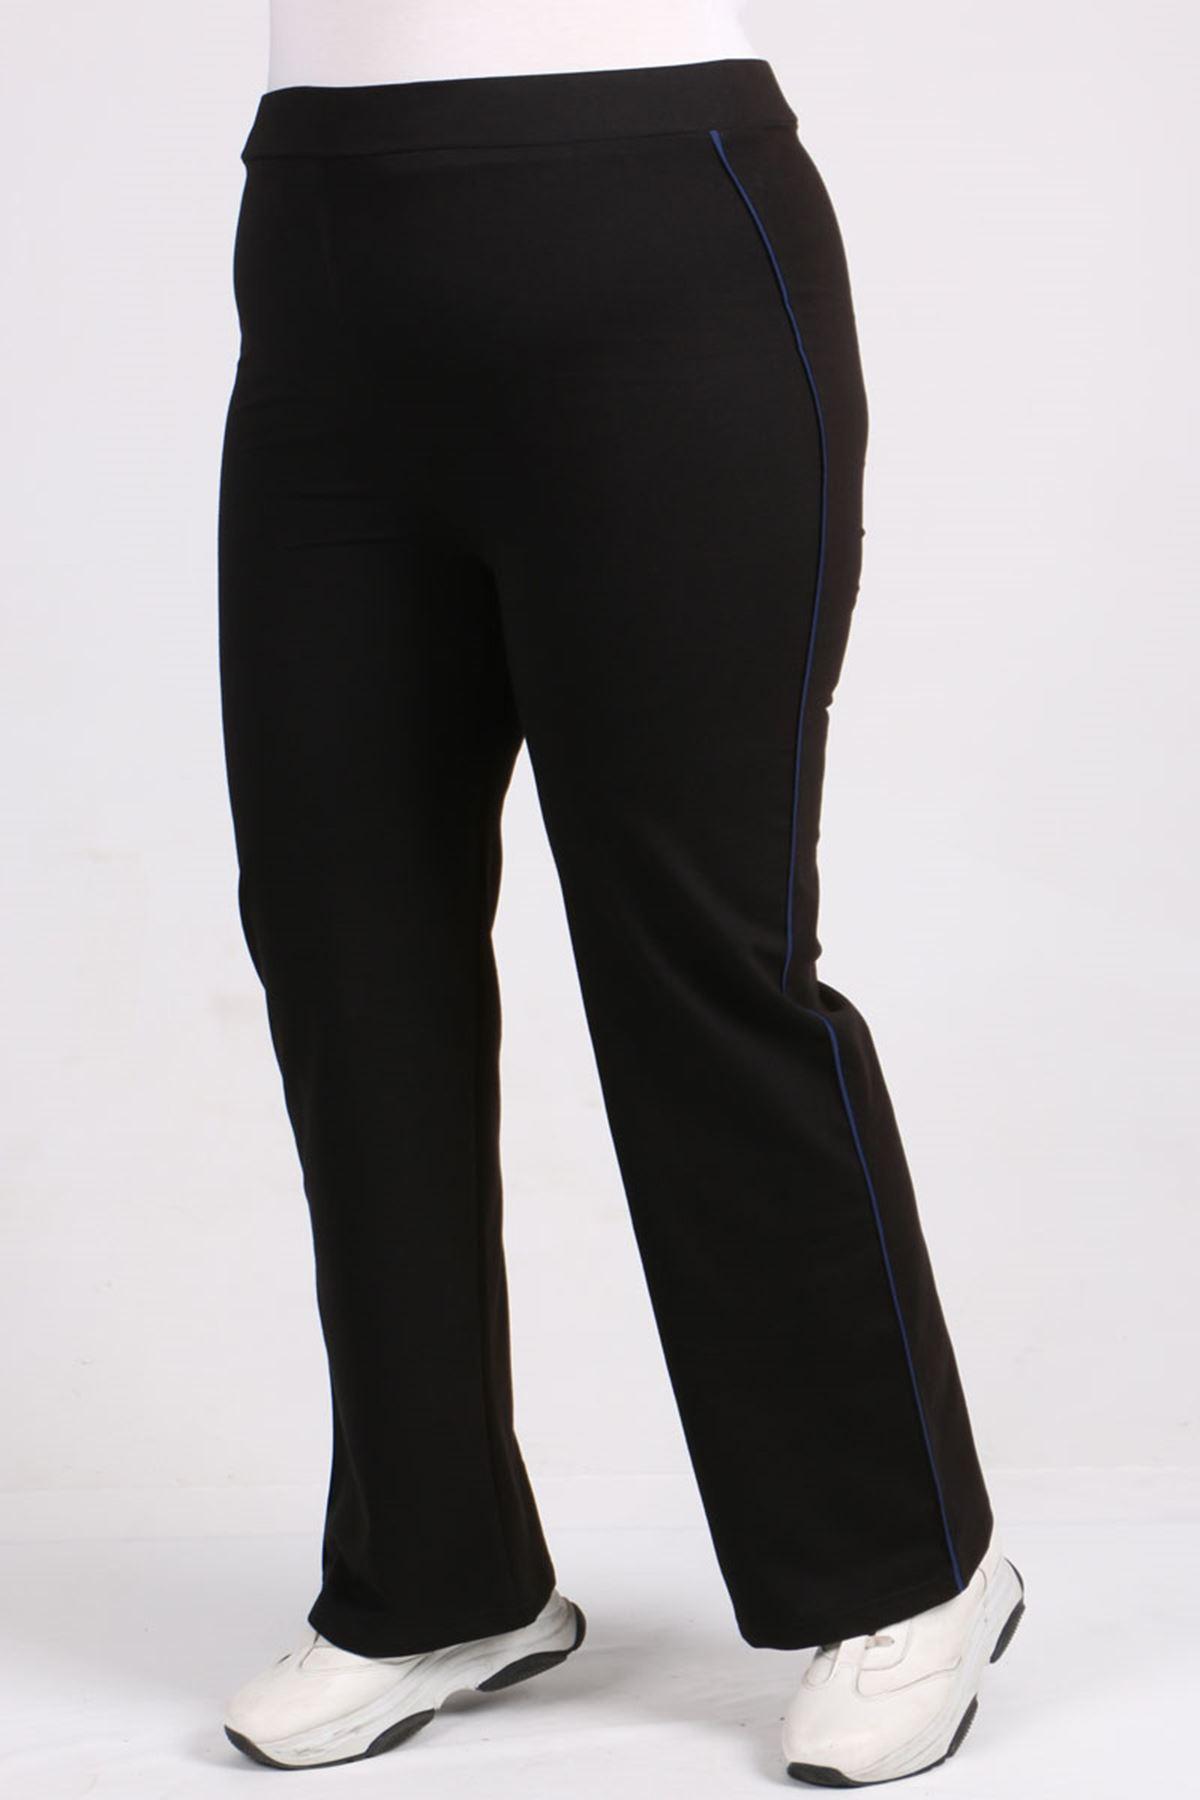 9531 Plus Size Sweatpants - Black - Saxe